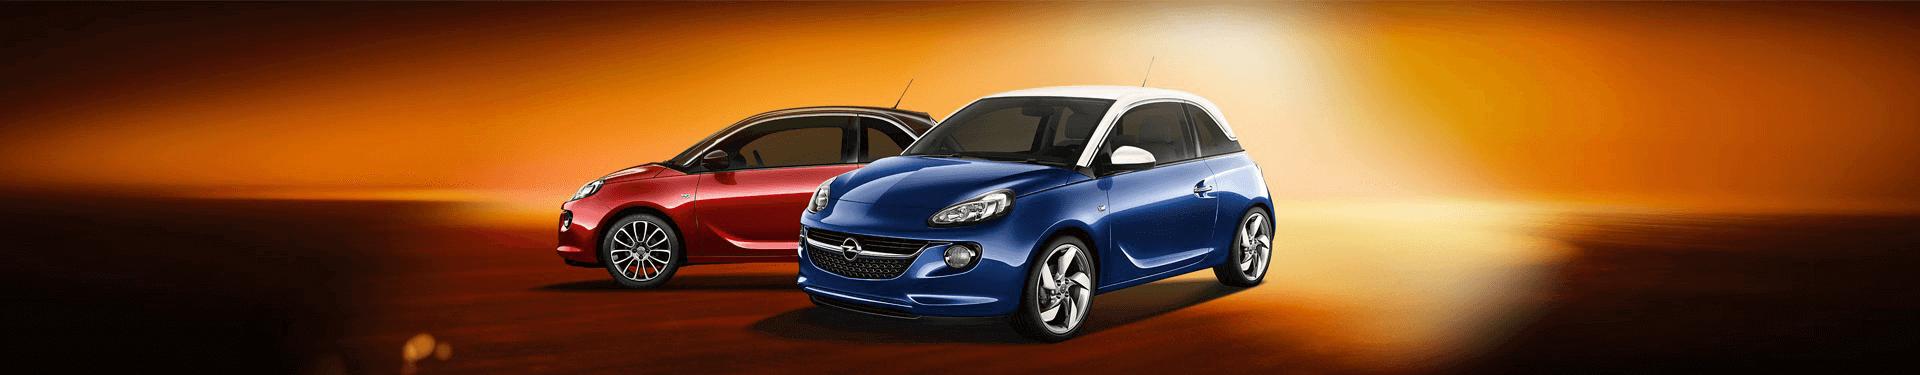 6b6813365e Car Rental Deals in Israel - Shlomo Sixt